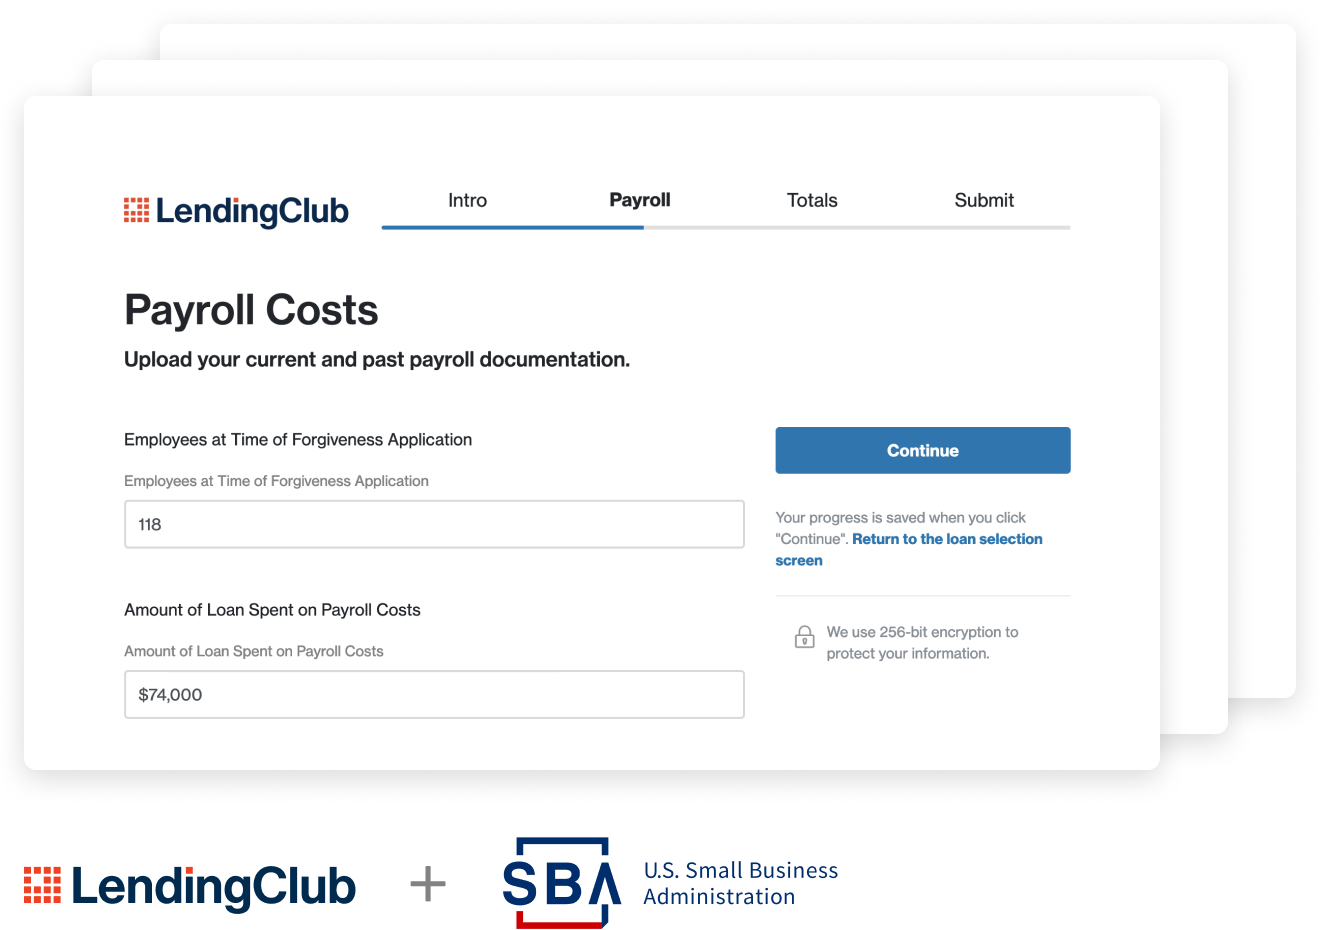 LendingClub Bank & Treasury Prime Small Business Administration Paycheck Protection Program loan forgiveness application screen